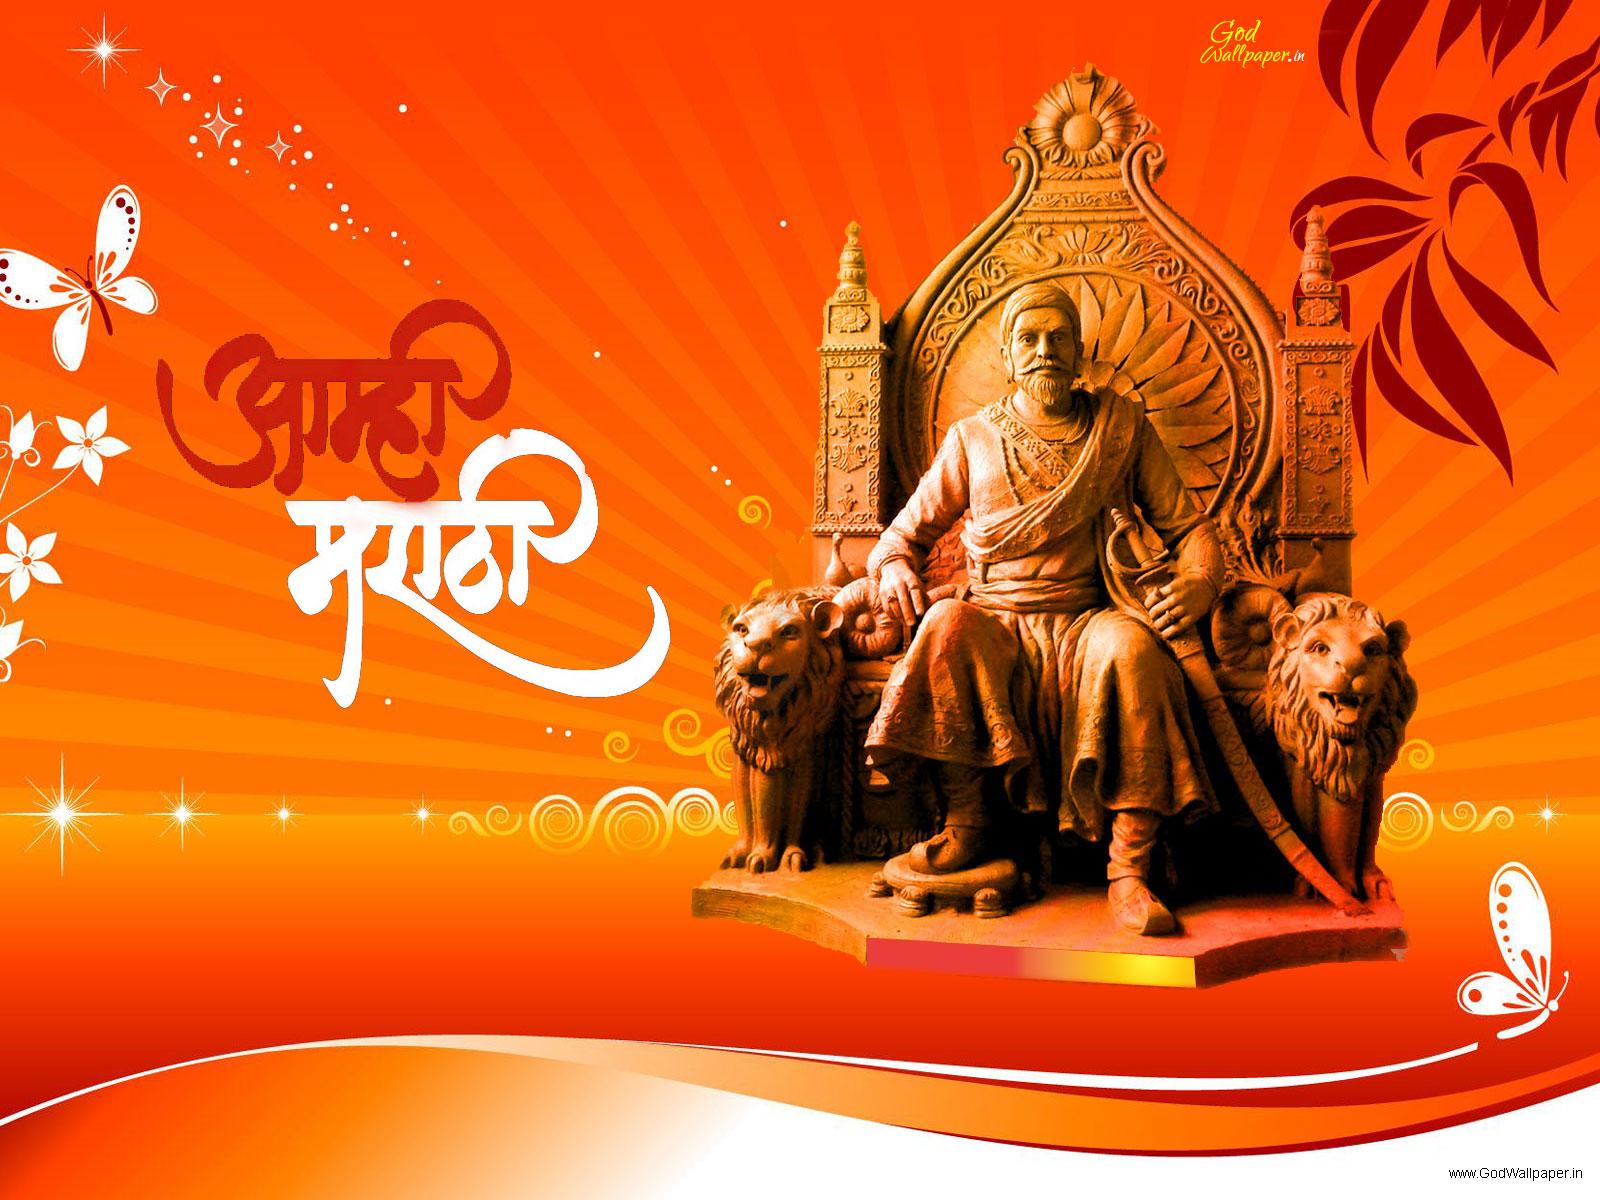 Shivaji Raje 3d Wallpaper Shivaji Images 2018 Printable Calendars Posters Images